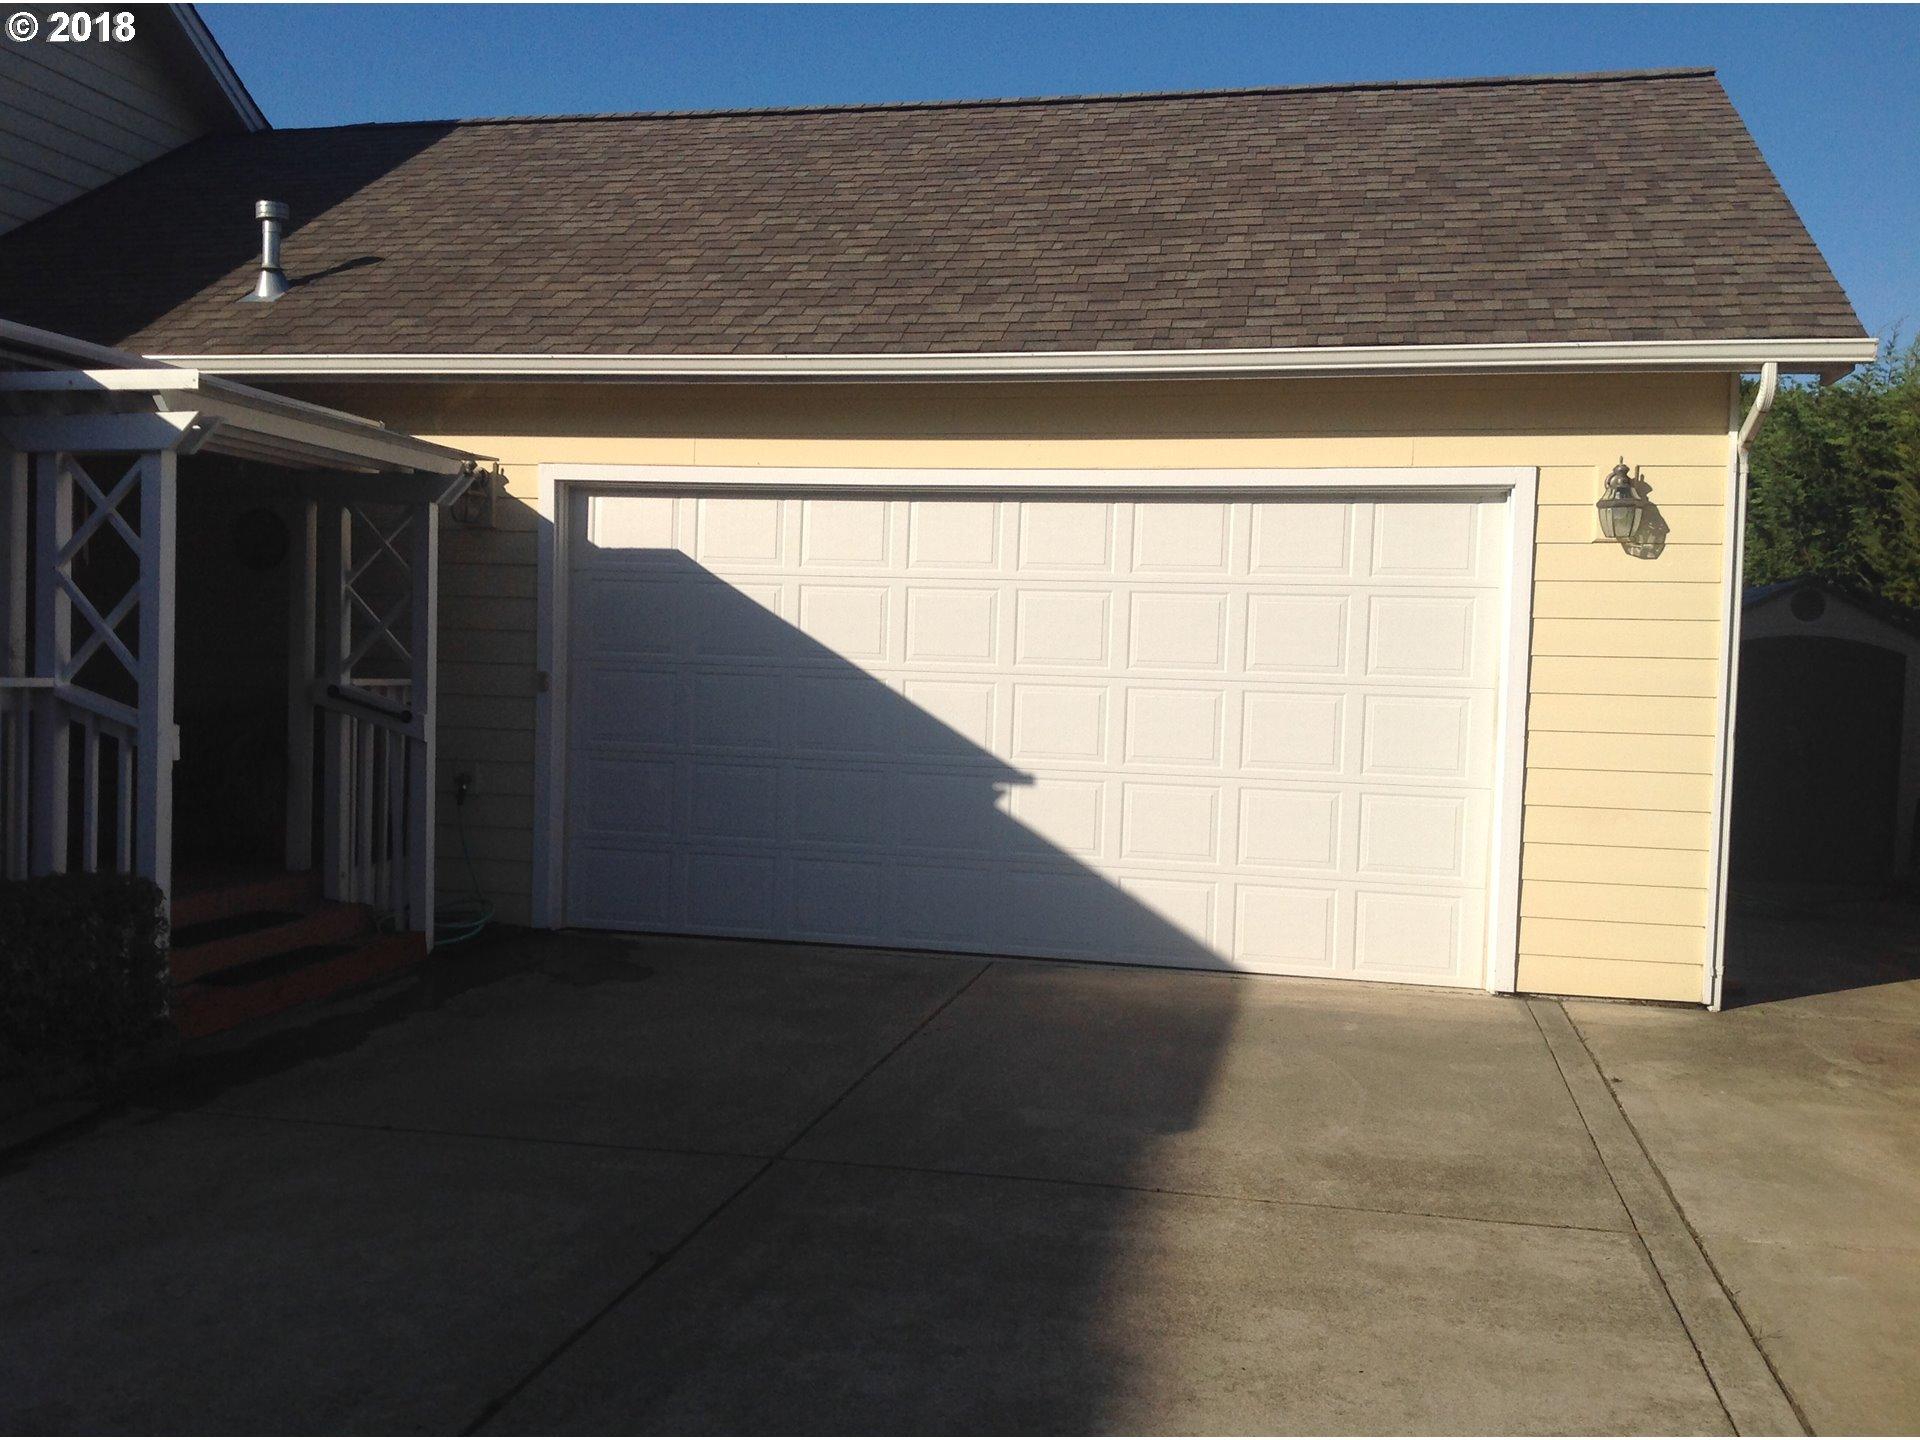 2041 GARFIELD ST North Bend, OR 97459 - MLS #: 18416505